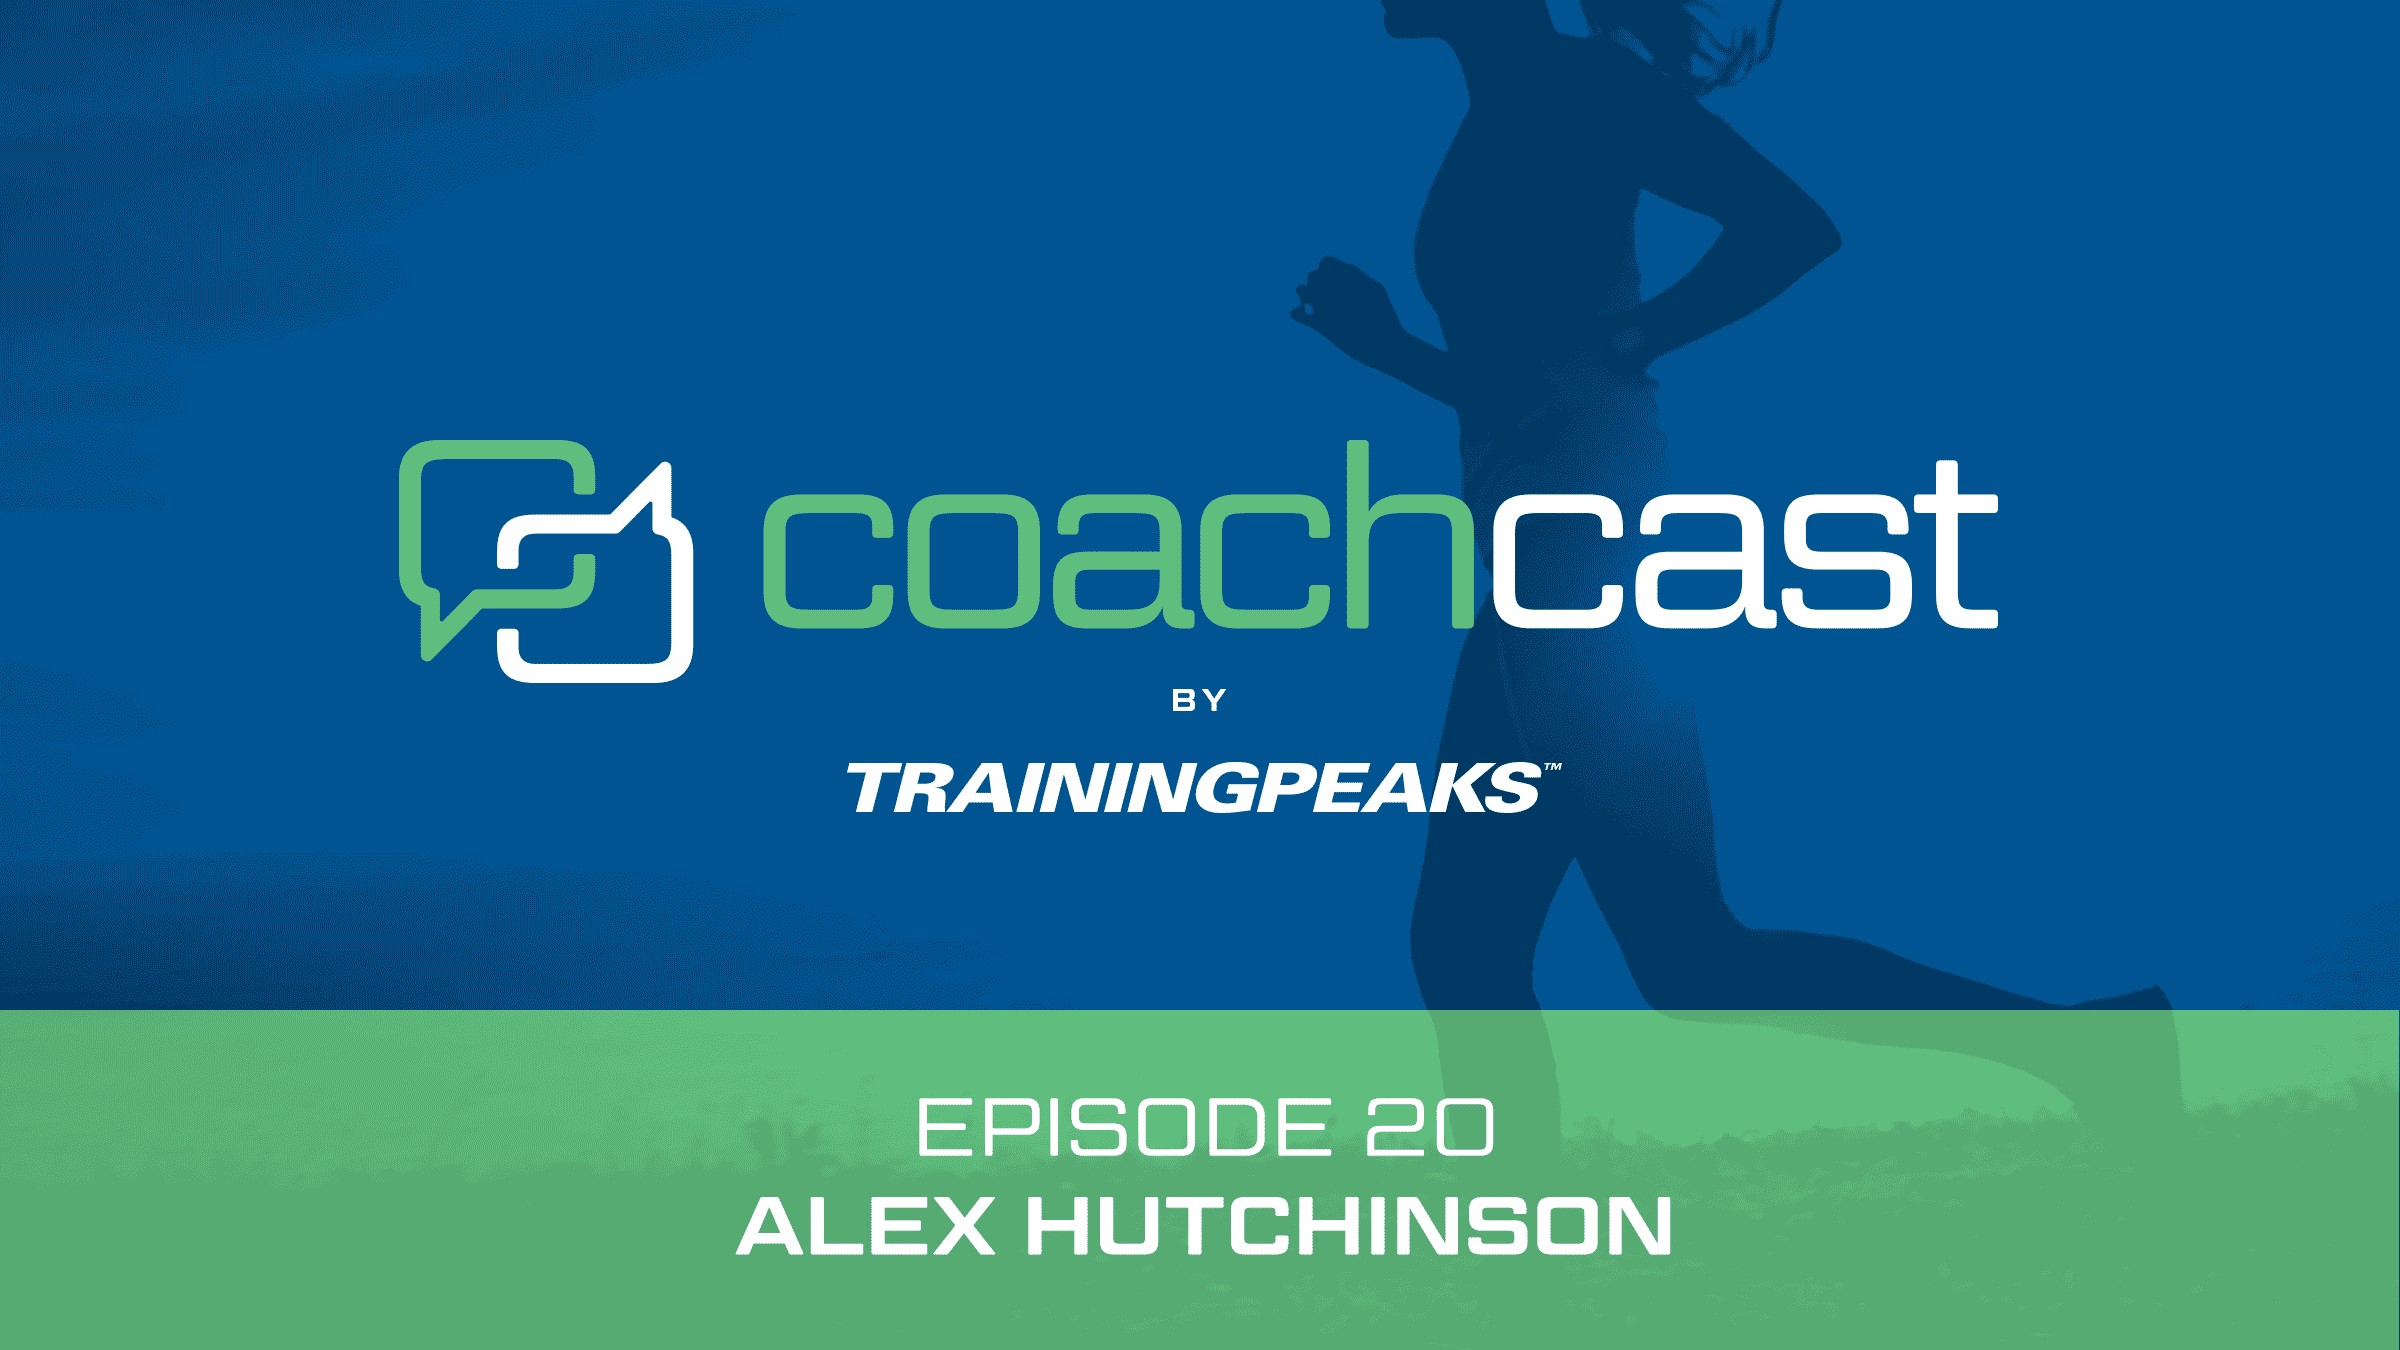 CoachCast: Endurance Elasticity with Alex Hutchinson